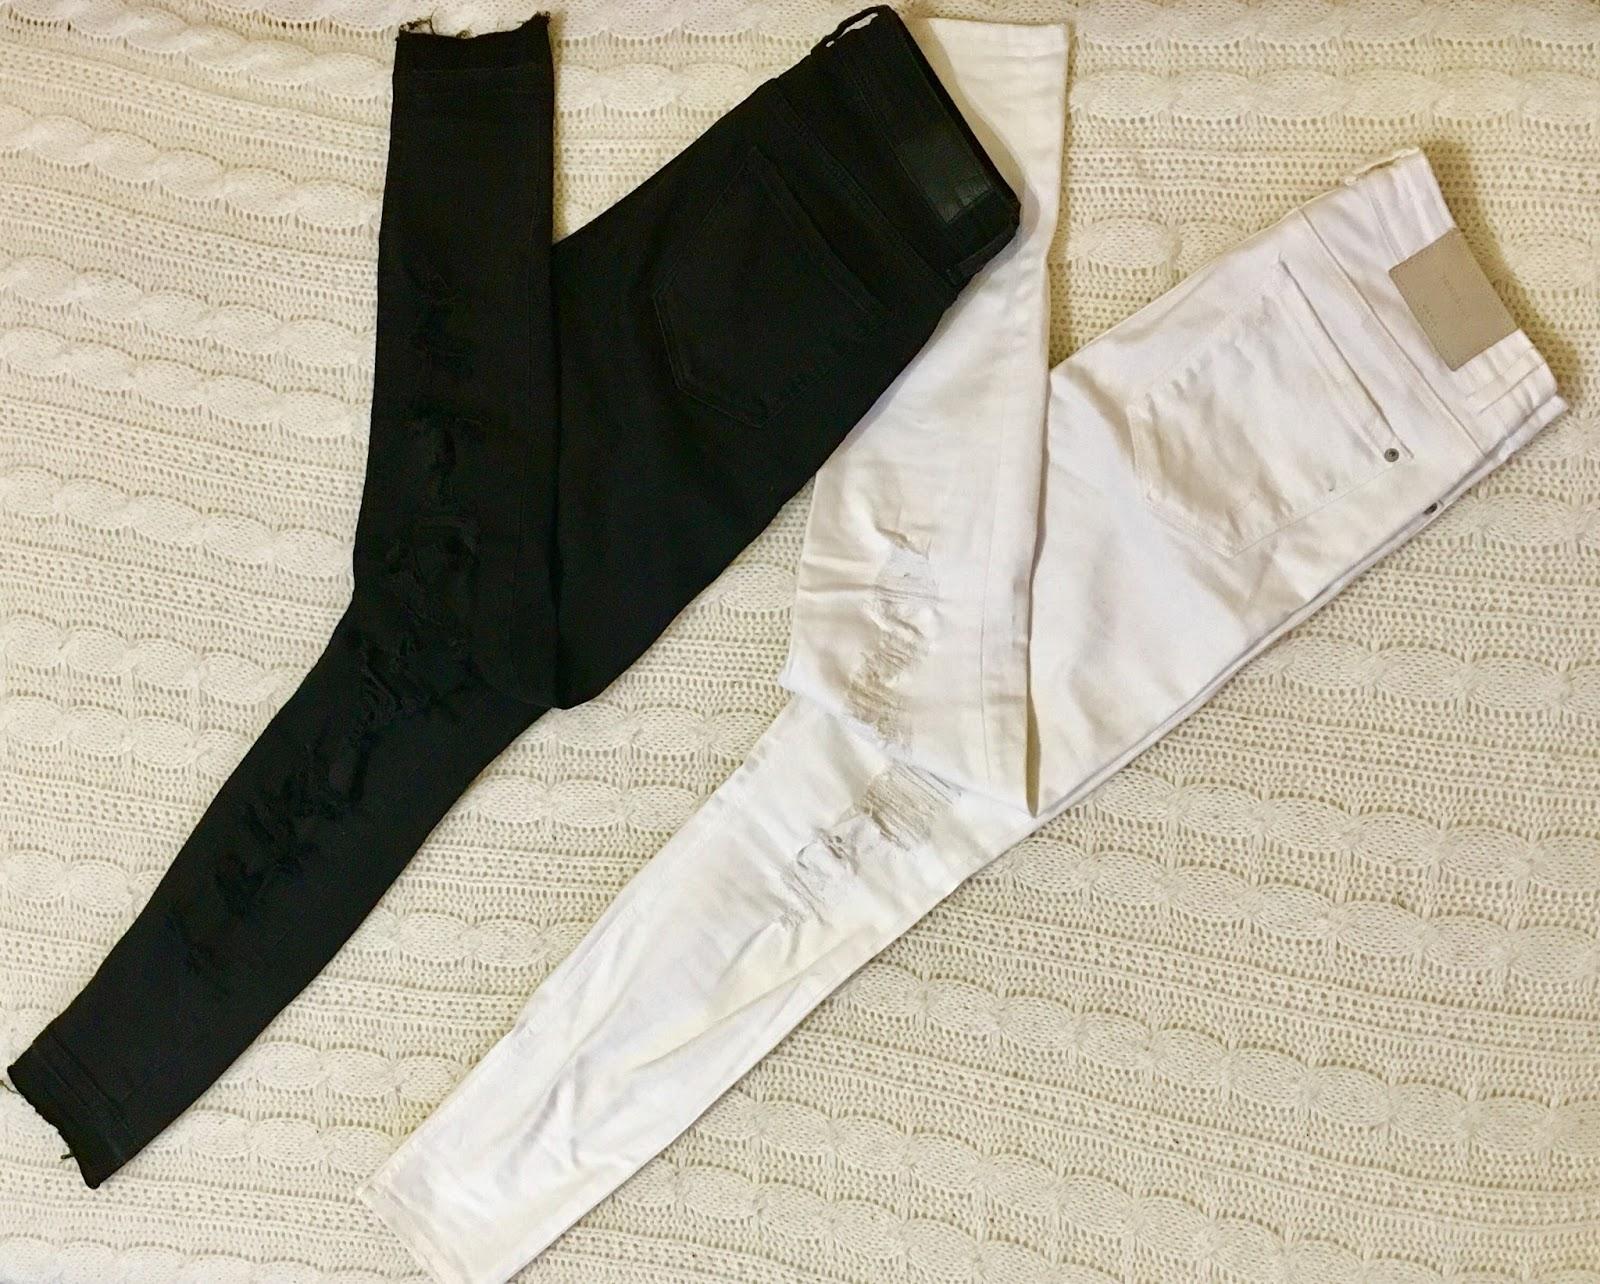 67e8c18f3fe9 Čierne BERSHKA nohavice -30€